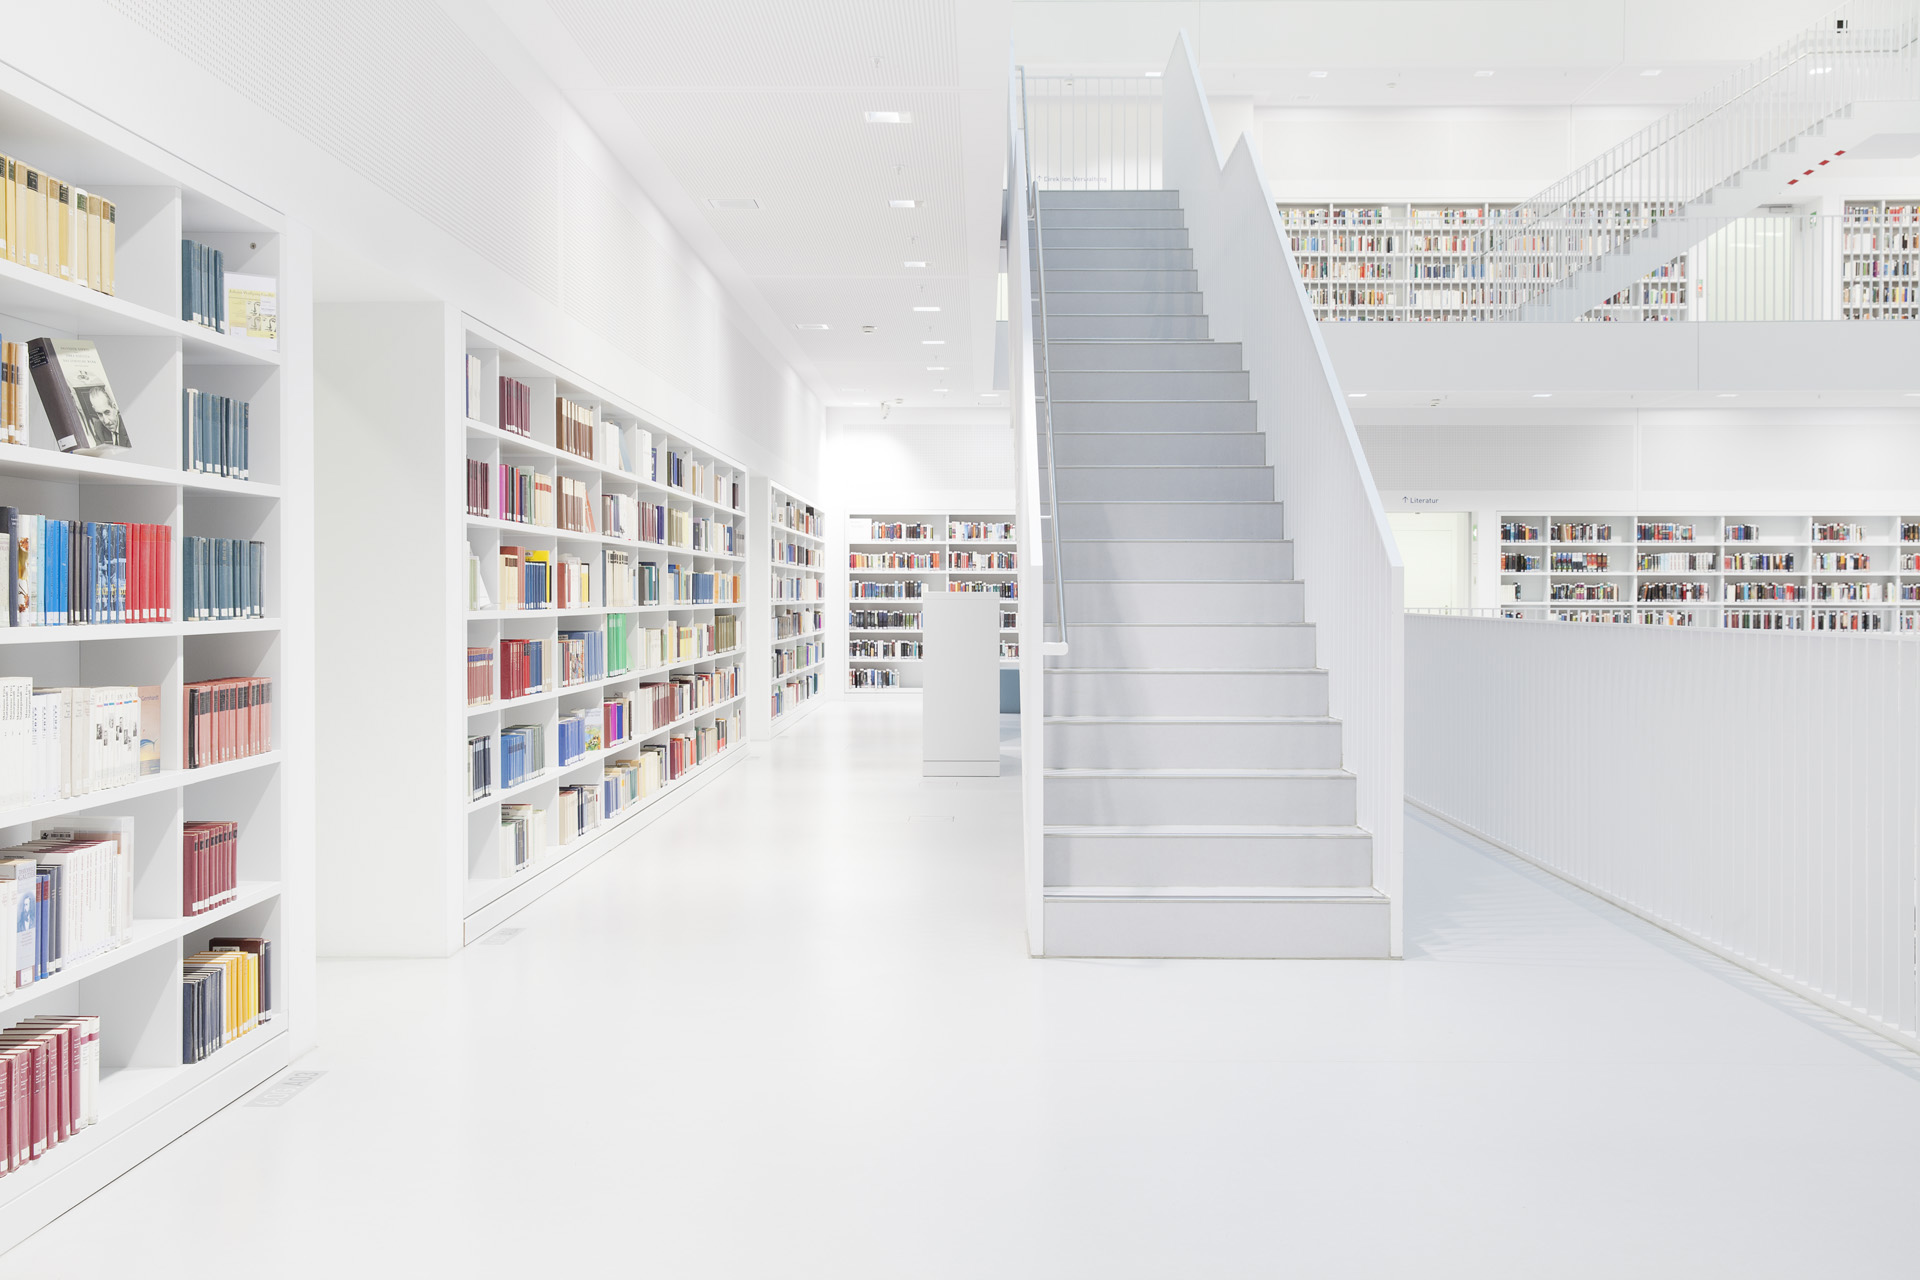 MG 0040 - Stadtbibliothek Stuttgart